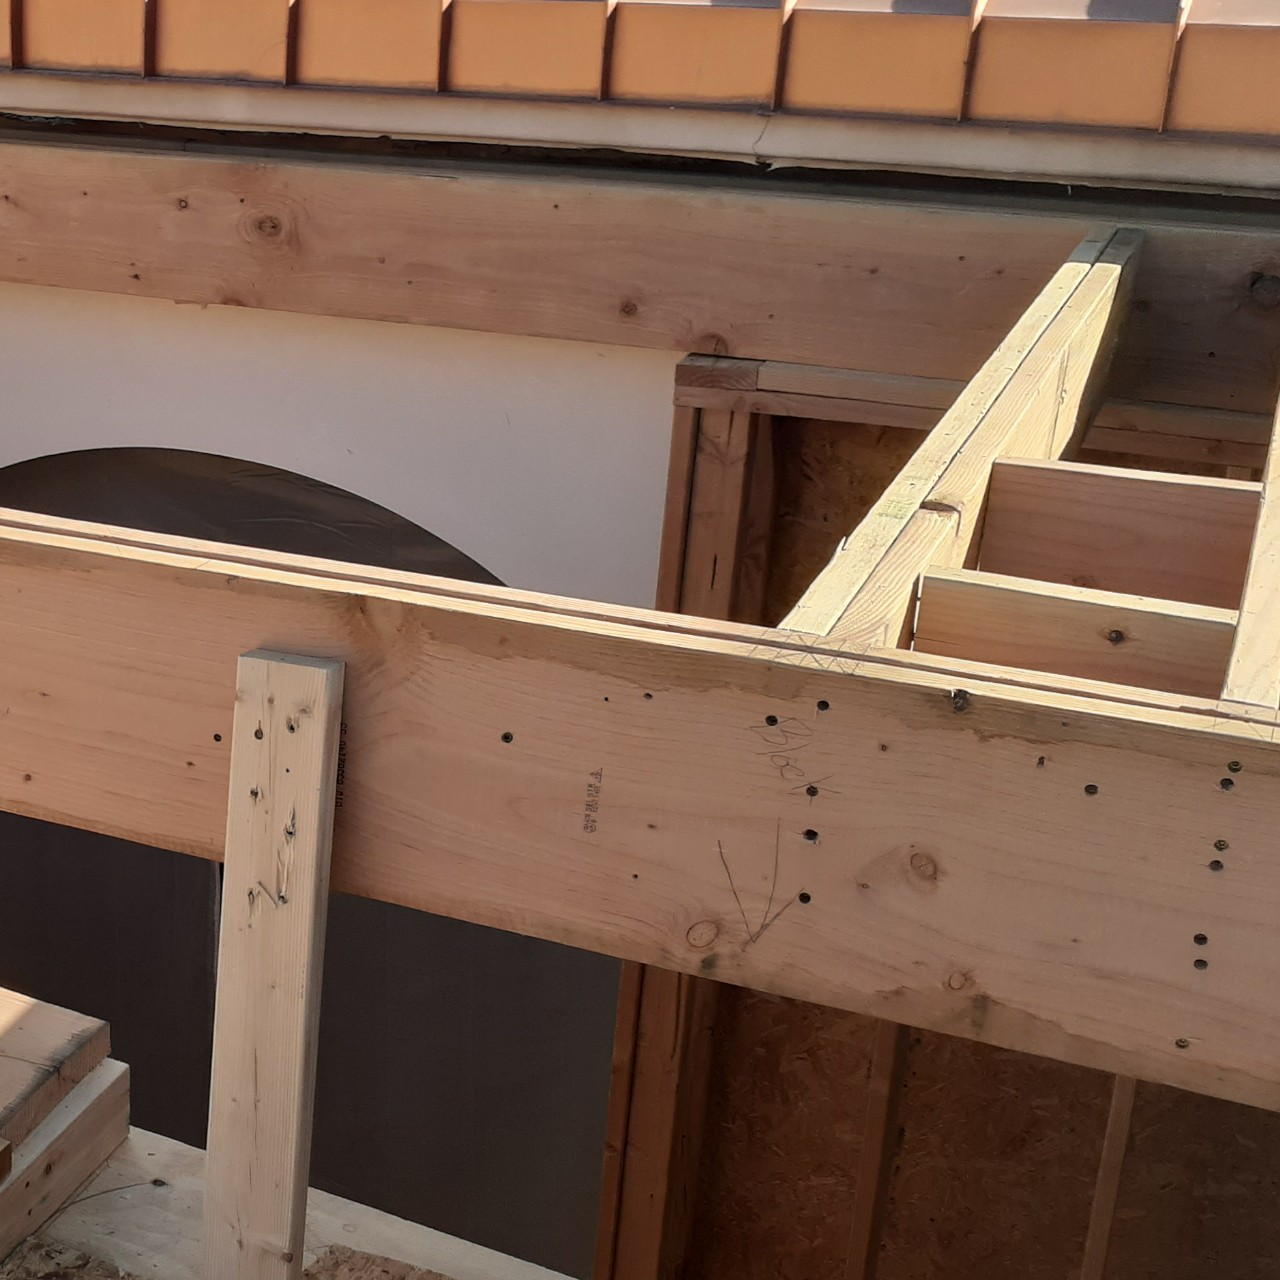 carpentry-wood-framing-second-floor-home-addition--framing-57